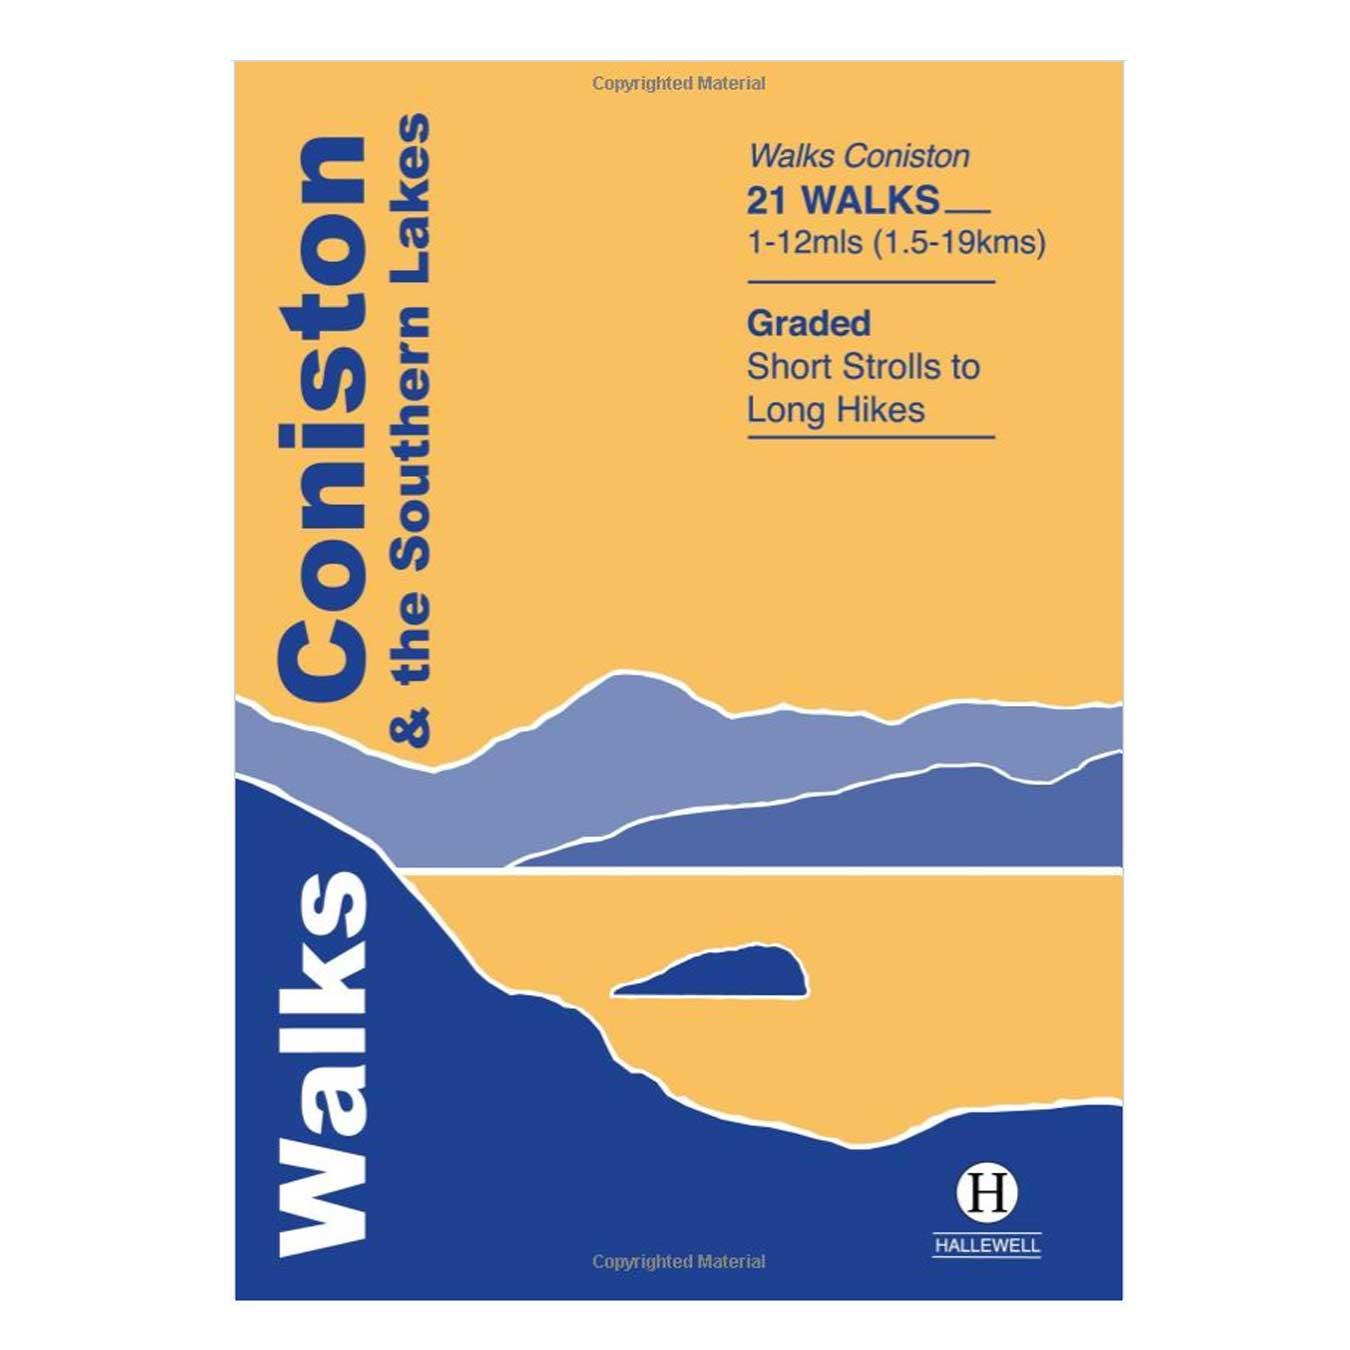 Walks Coniston